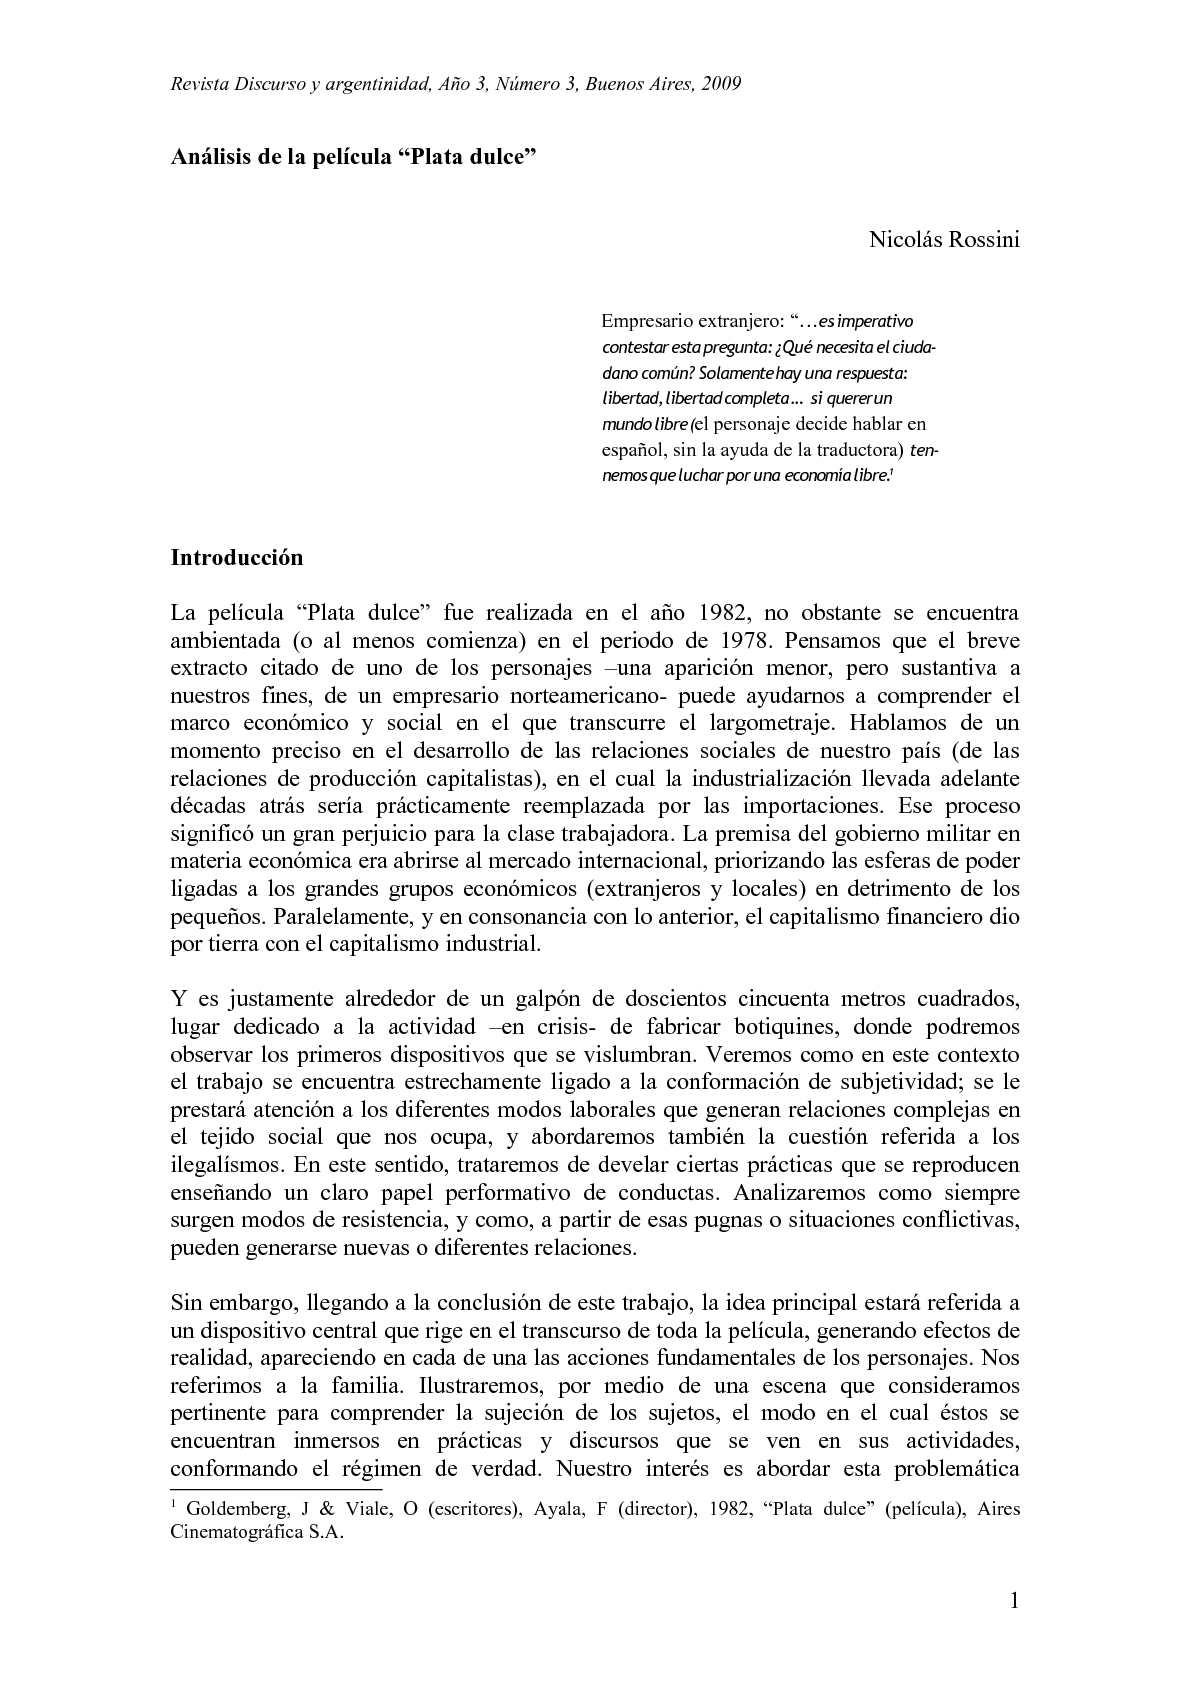 Nicolas Rossini. Análisis de la película Plata Dulce